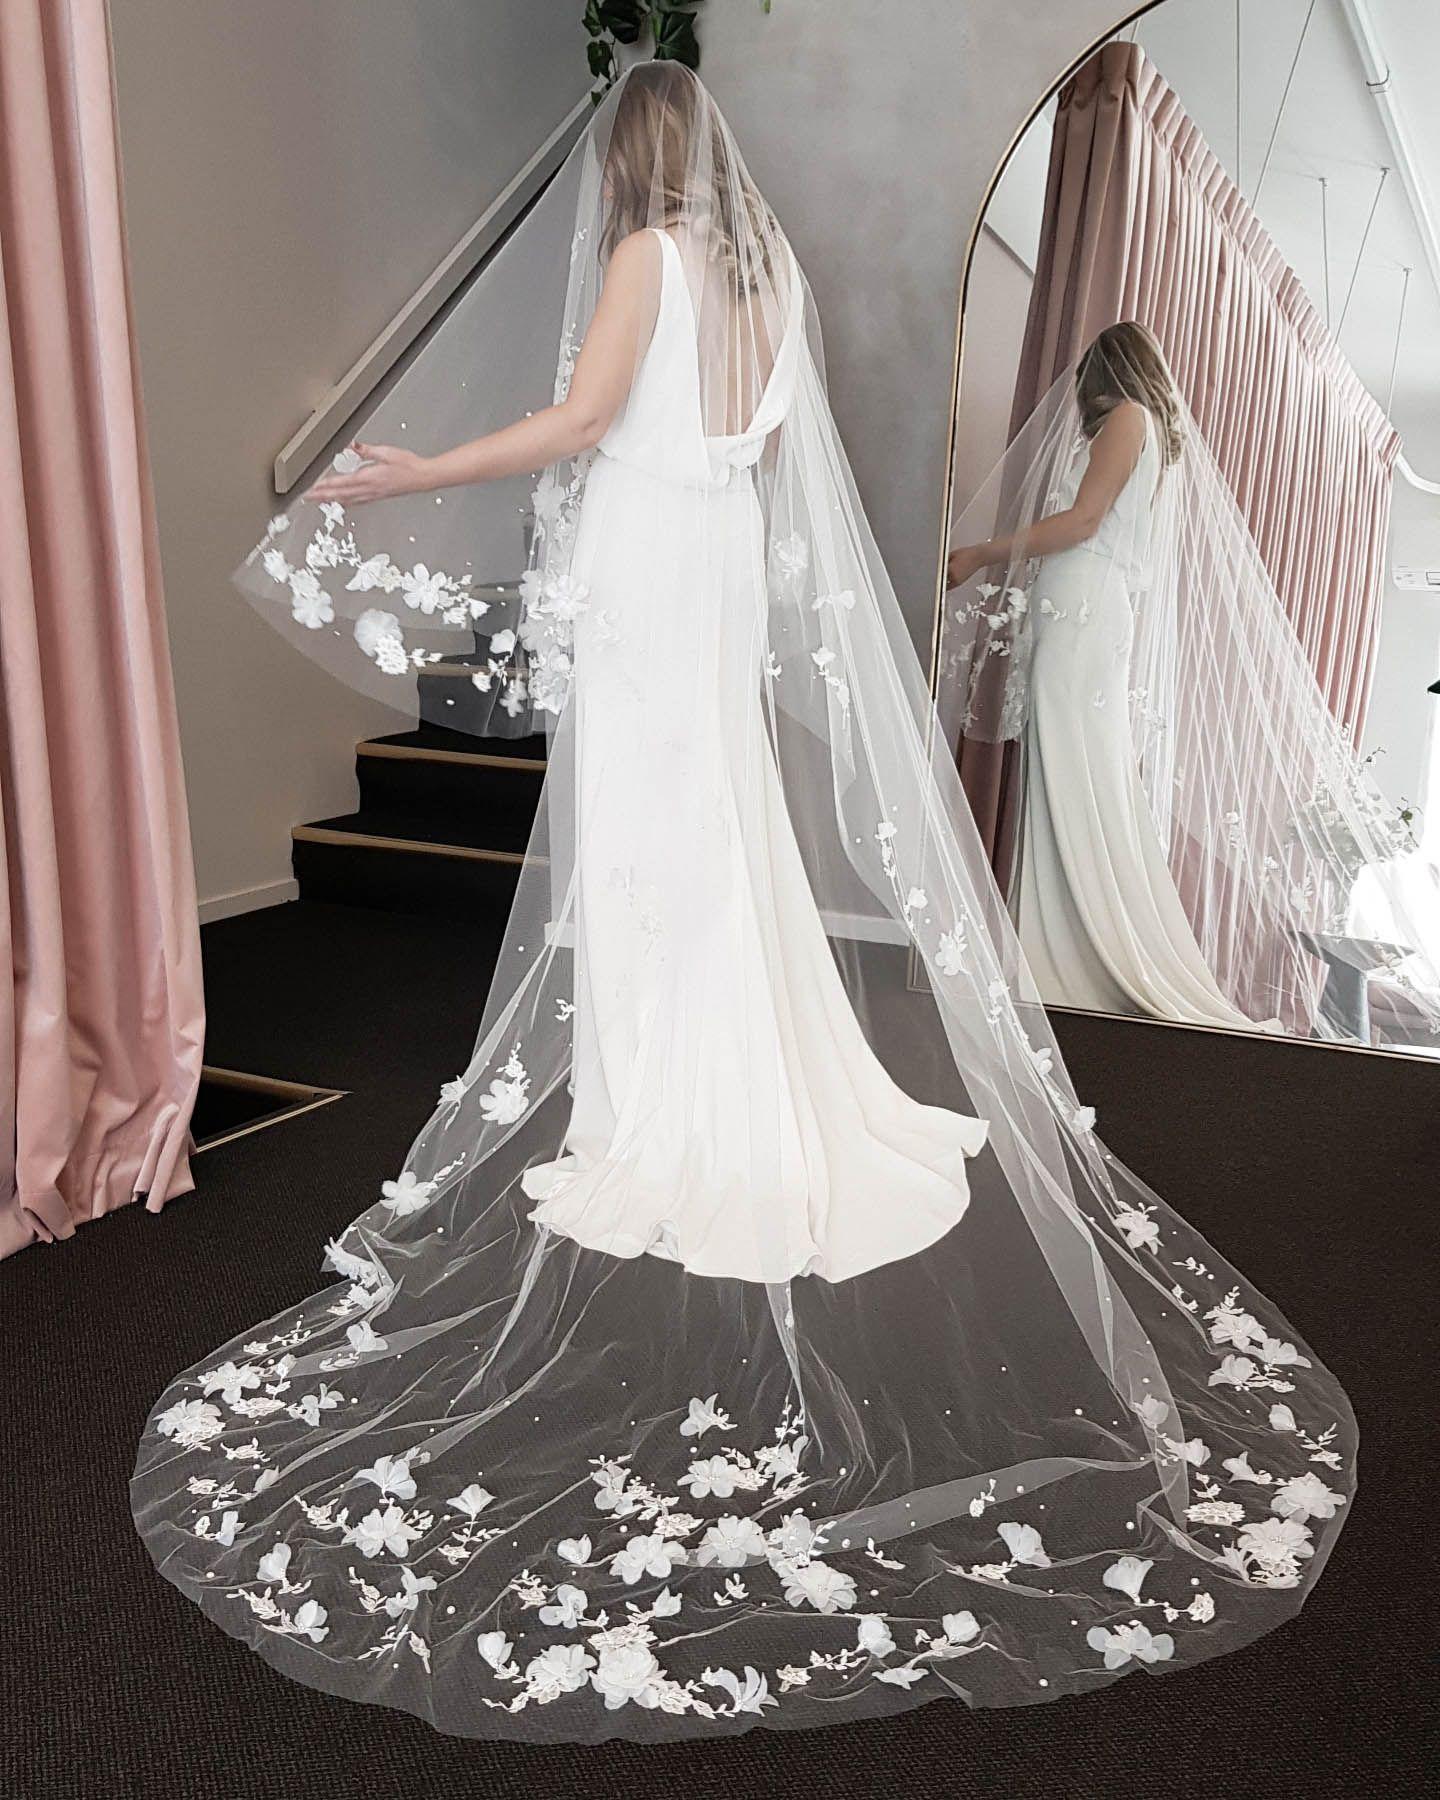 How To Style A Dramatic Wedding Veil Tania Maras Bespoke Wedding Headpieces Wedding Veils In 2020 Amazing Wedding Dress Simple Wedding Gowns Wedding Bridal Veils [ 1800 x 1440 Pixel ]